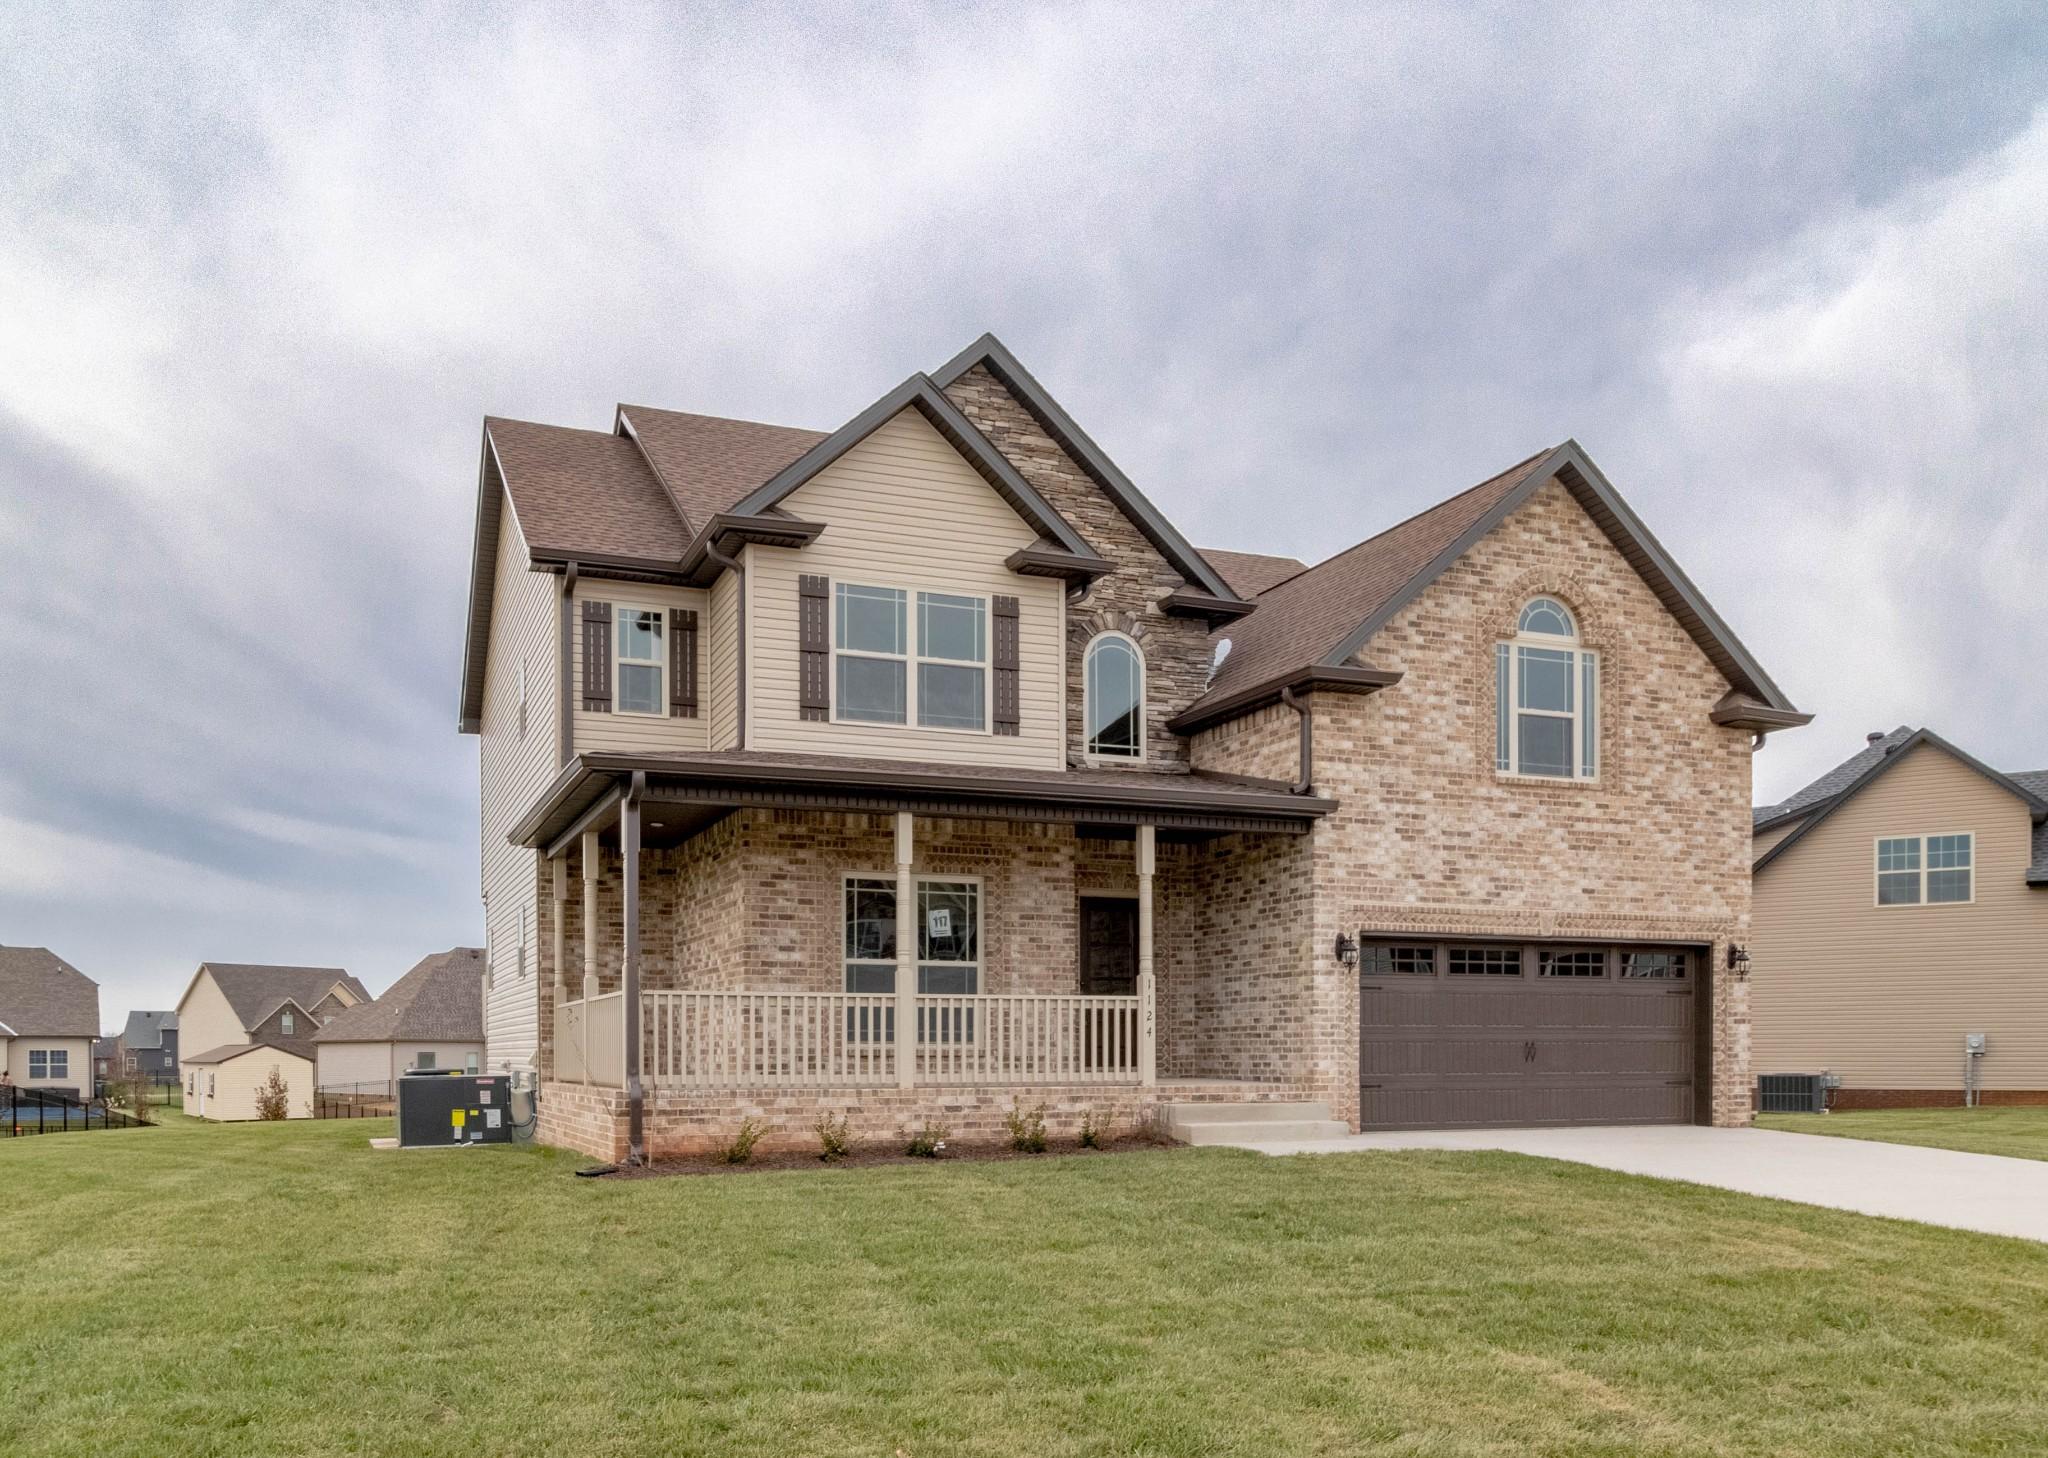 117 Wellington Fields, Clarksville, TN 37043 - Clarksville, TN real estate listing